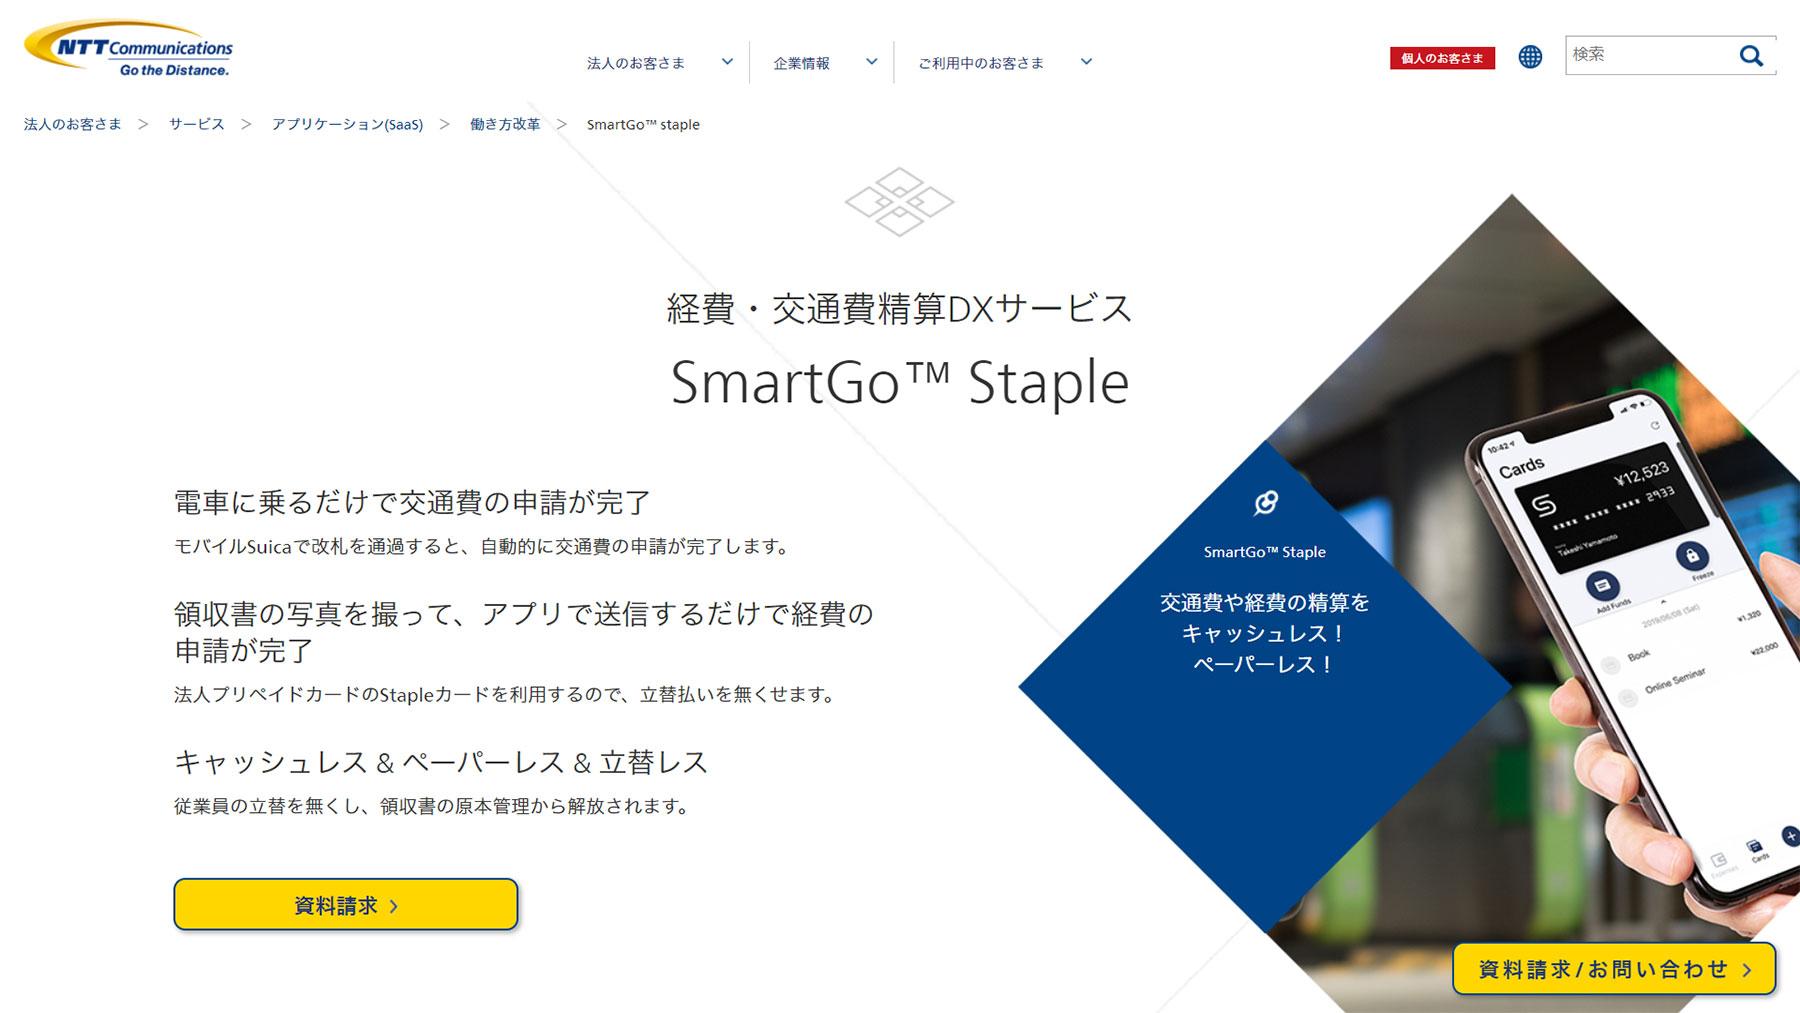 SmartGo Staple